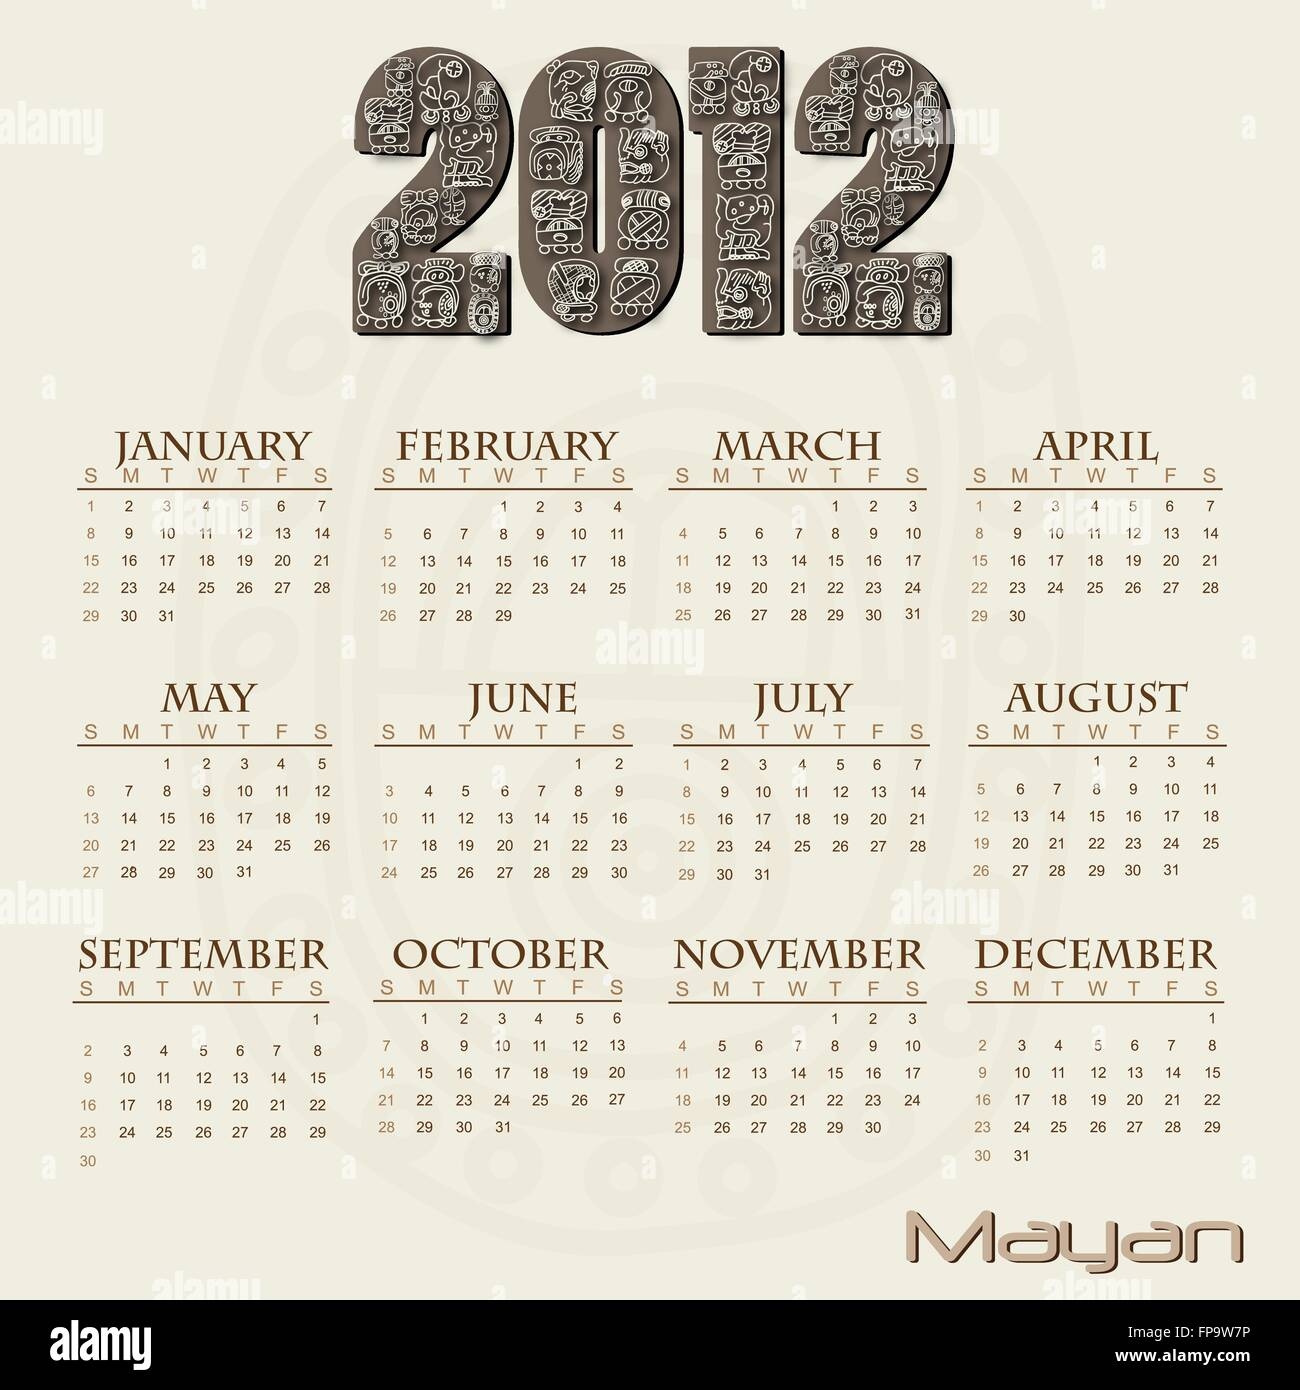 Image of a Mayan themed 2012 calendar. Stock Vector